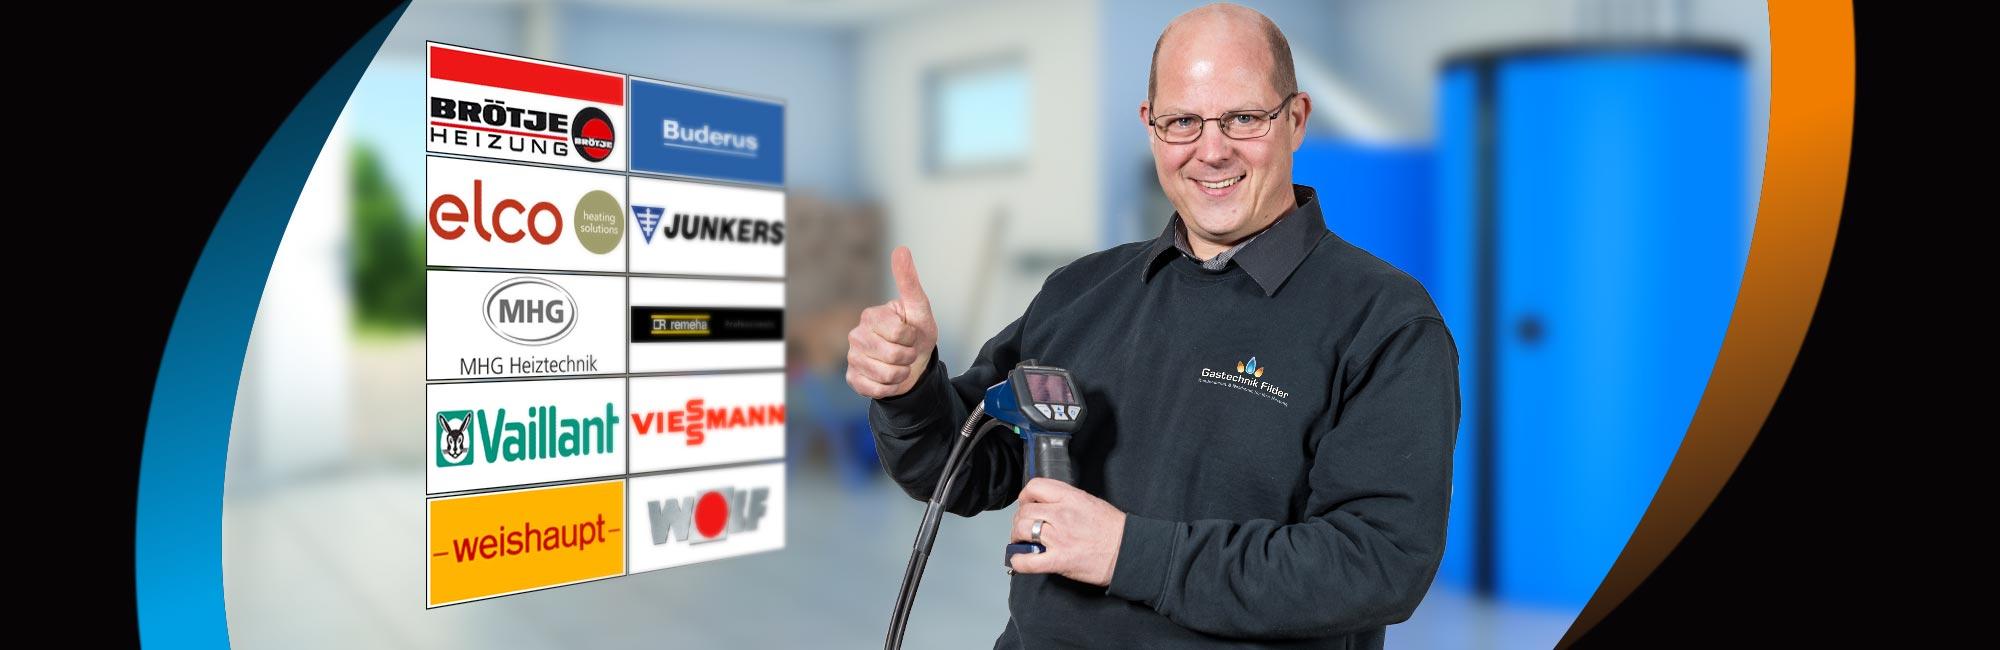 Alle Heizungsmarken - Gastechnik Filder Fritzsch